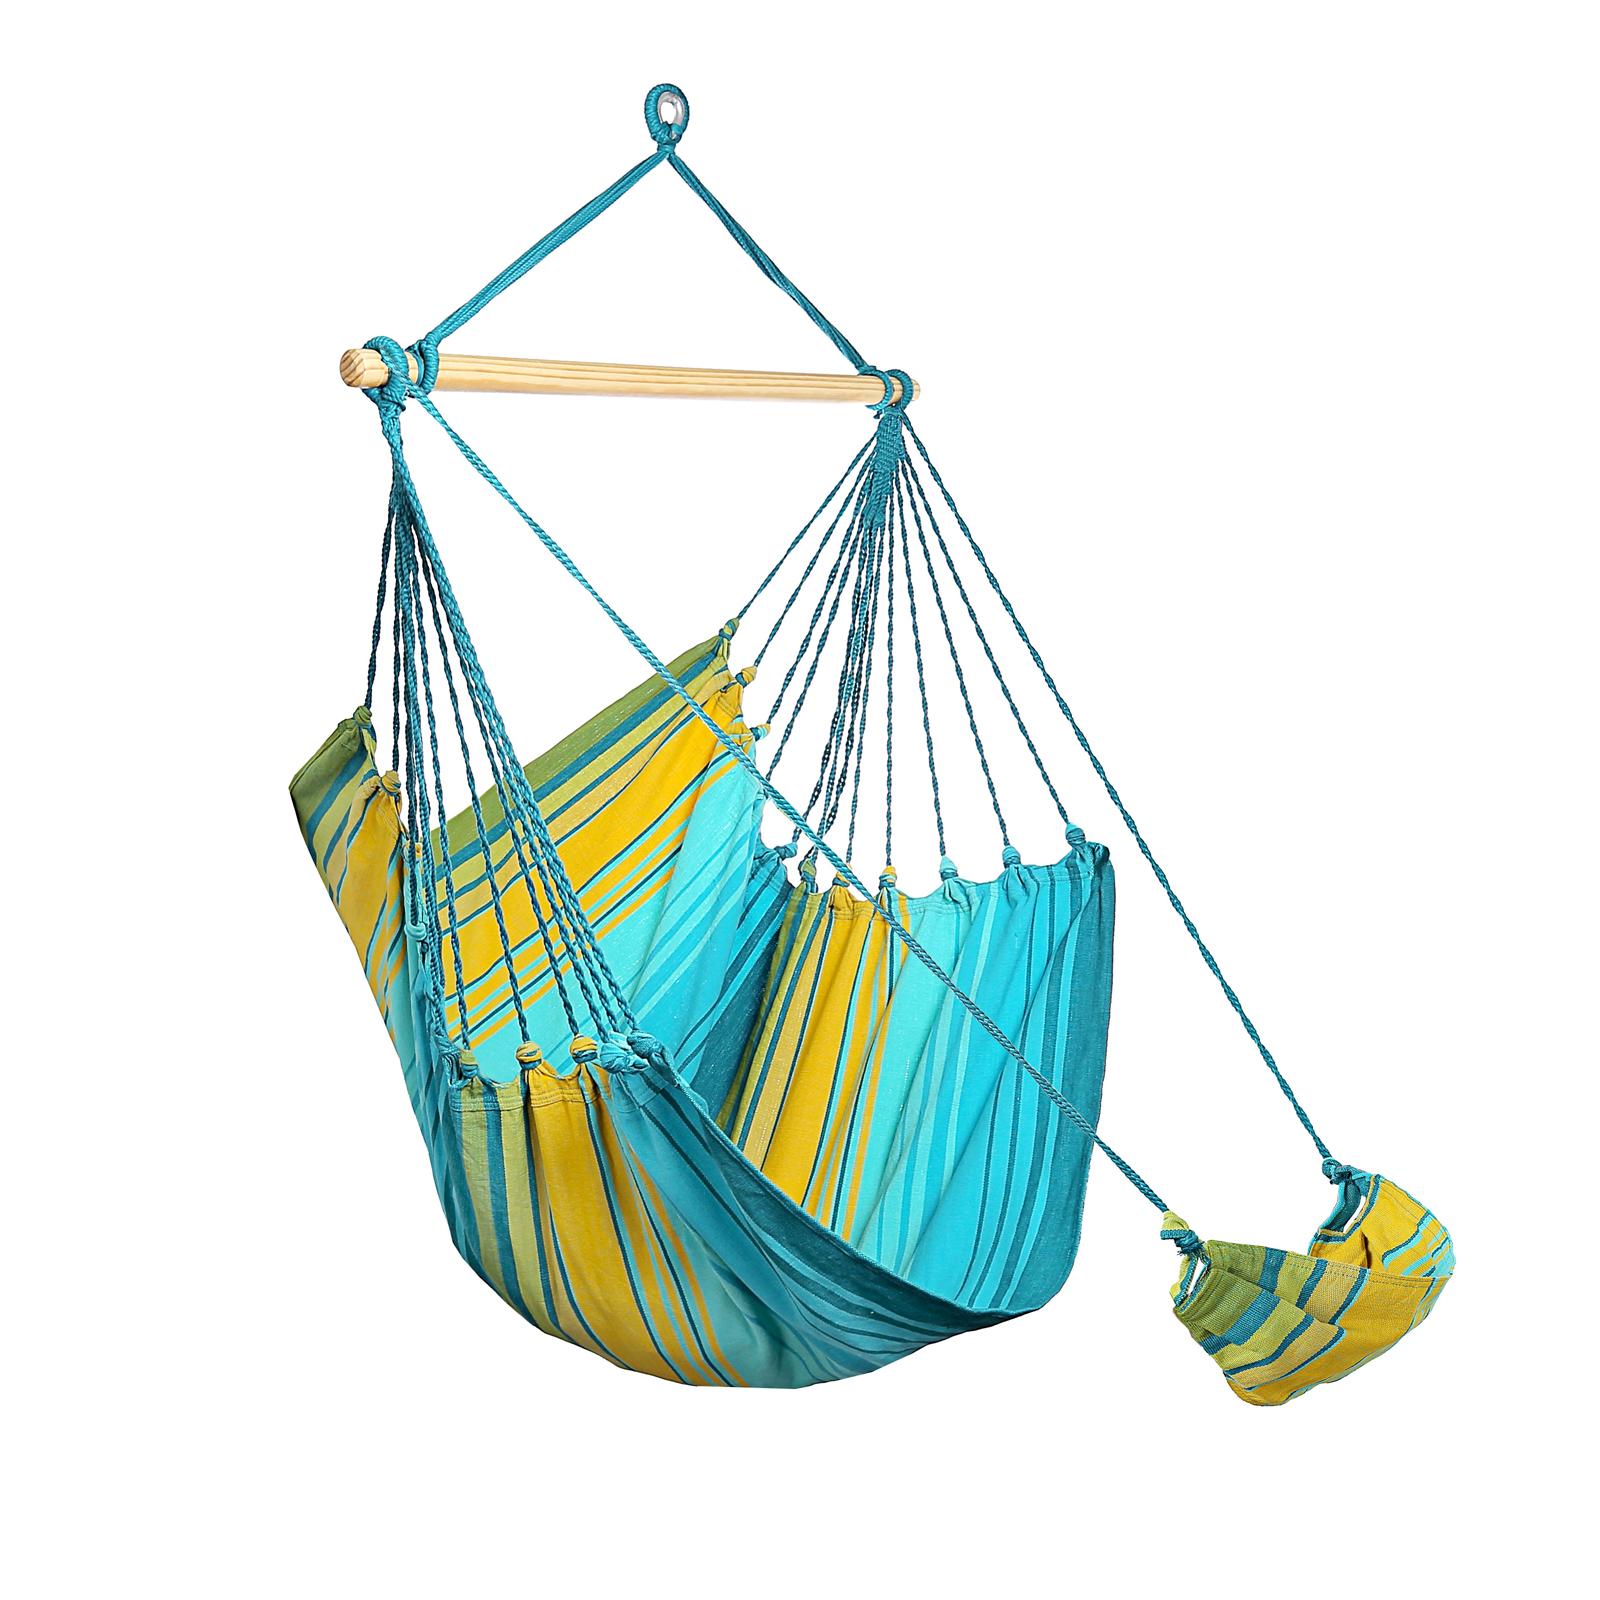 chaise hamac double bleue jaune